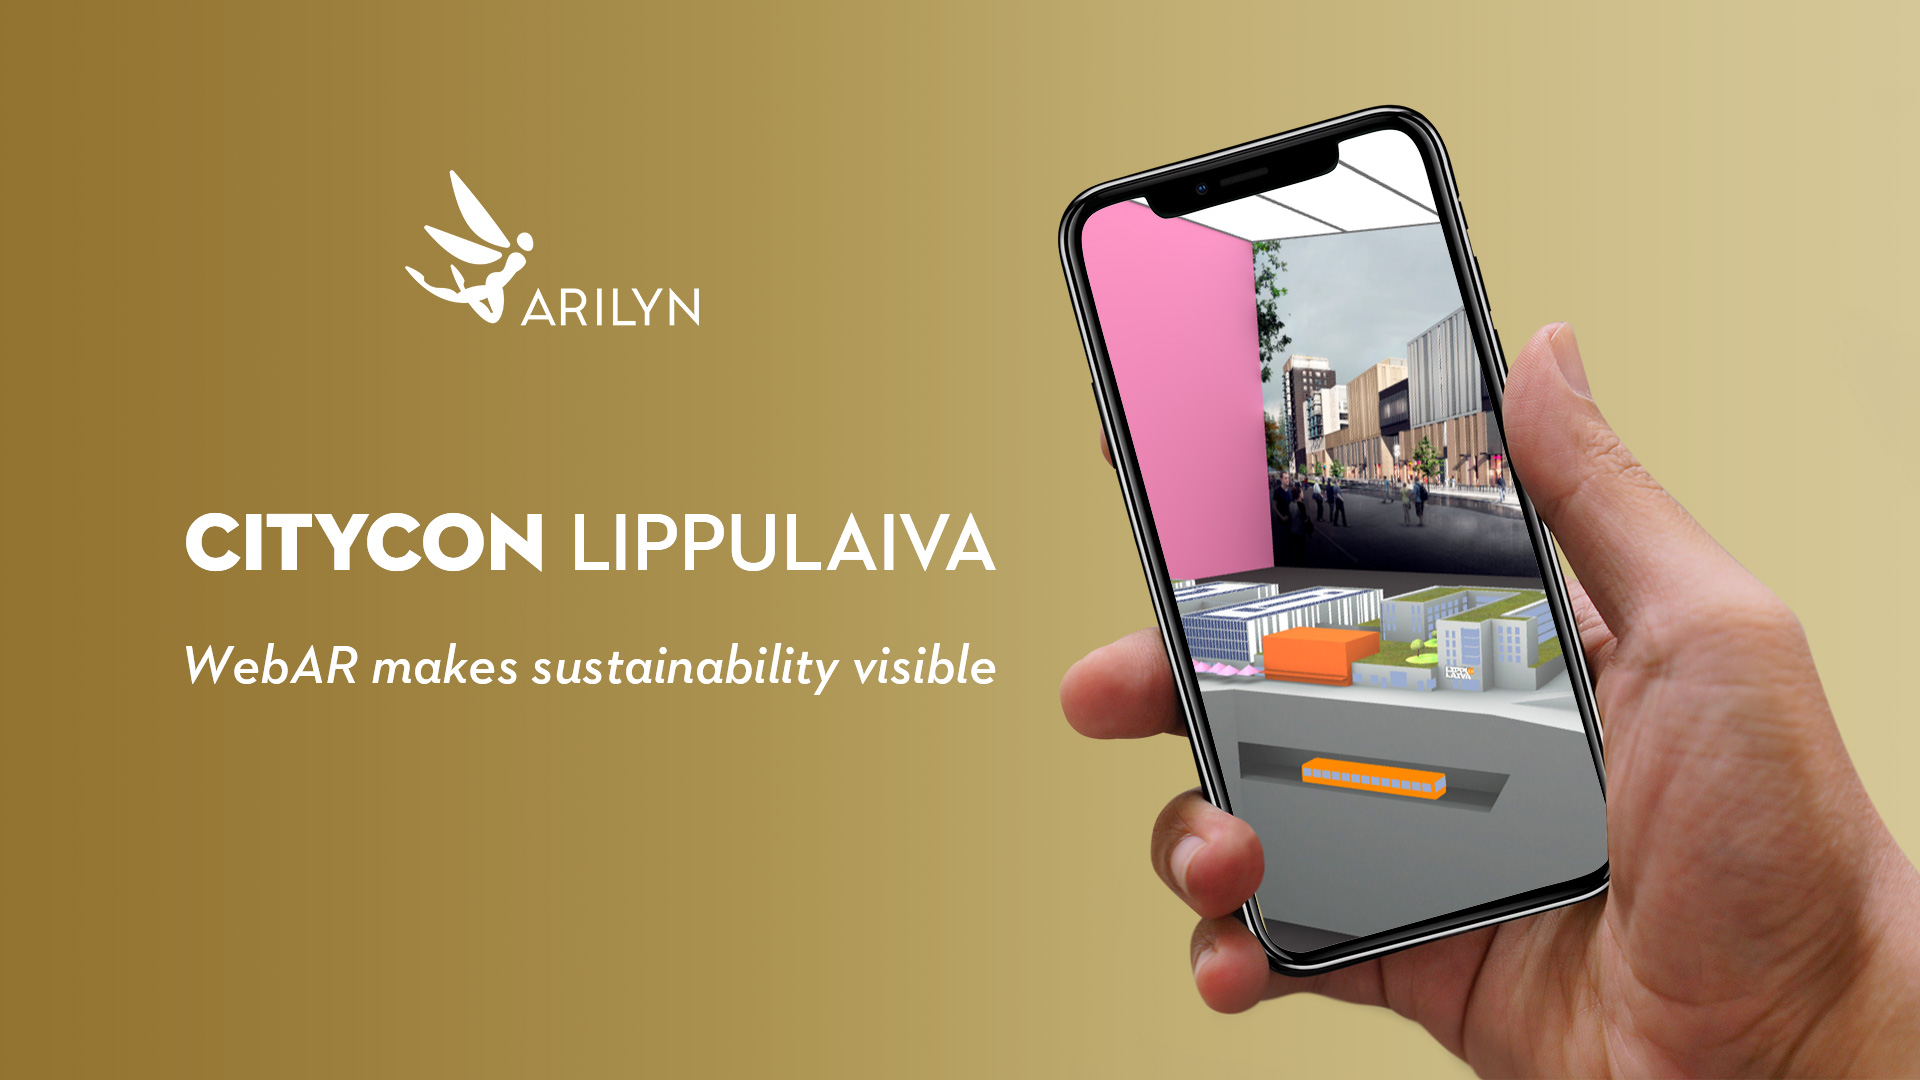 WebAR makes sustainability visible - virtual visit to Lippulaiva